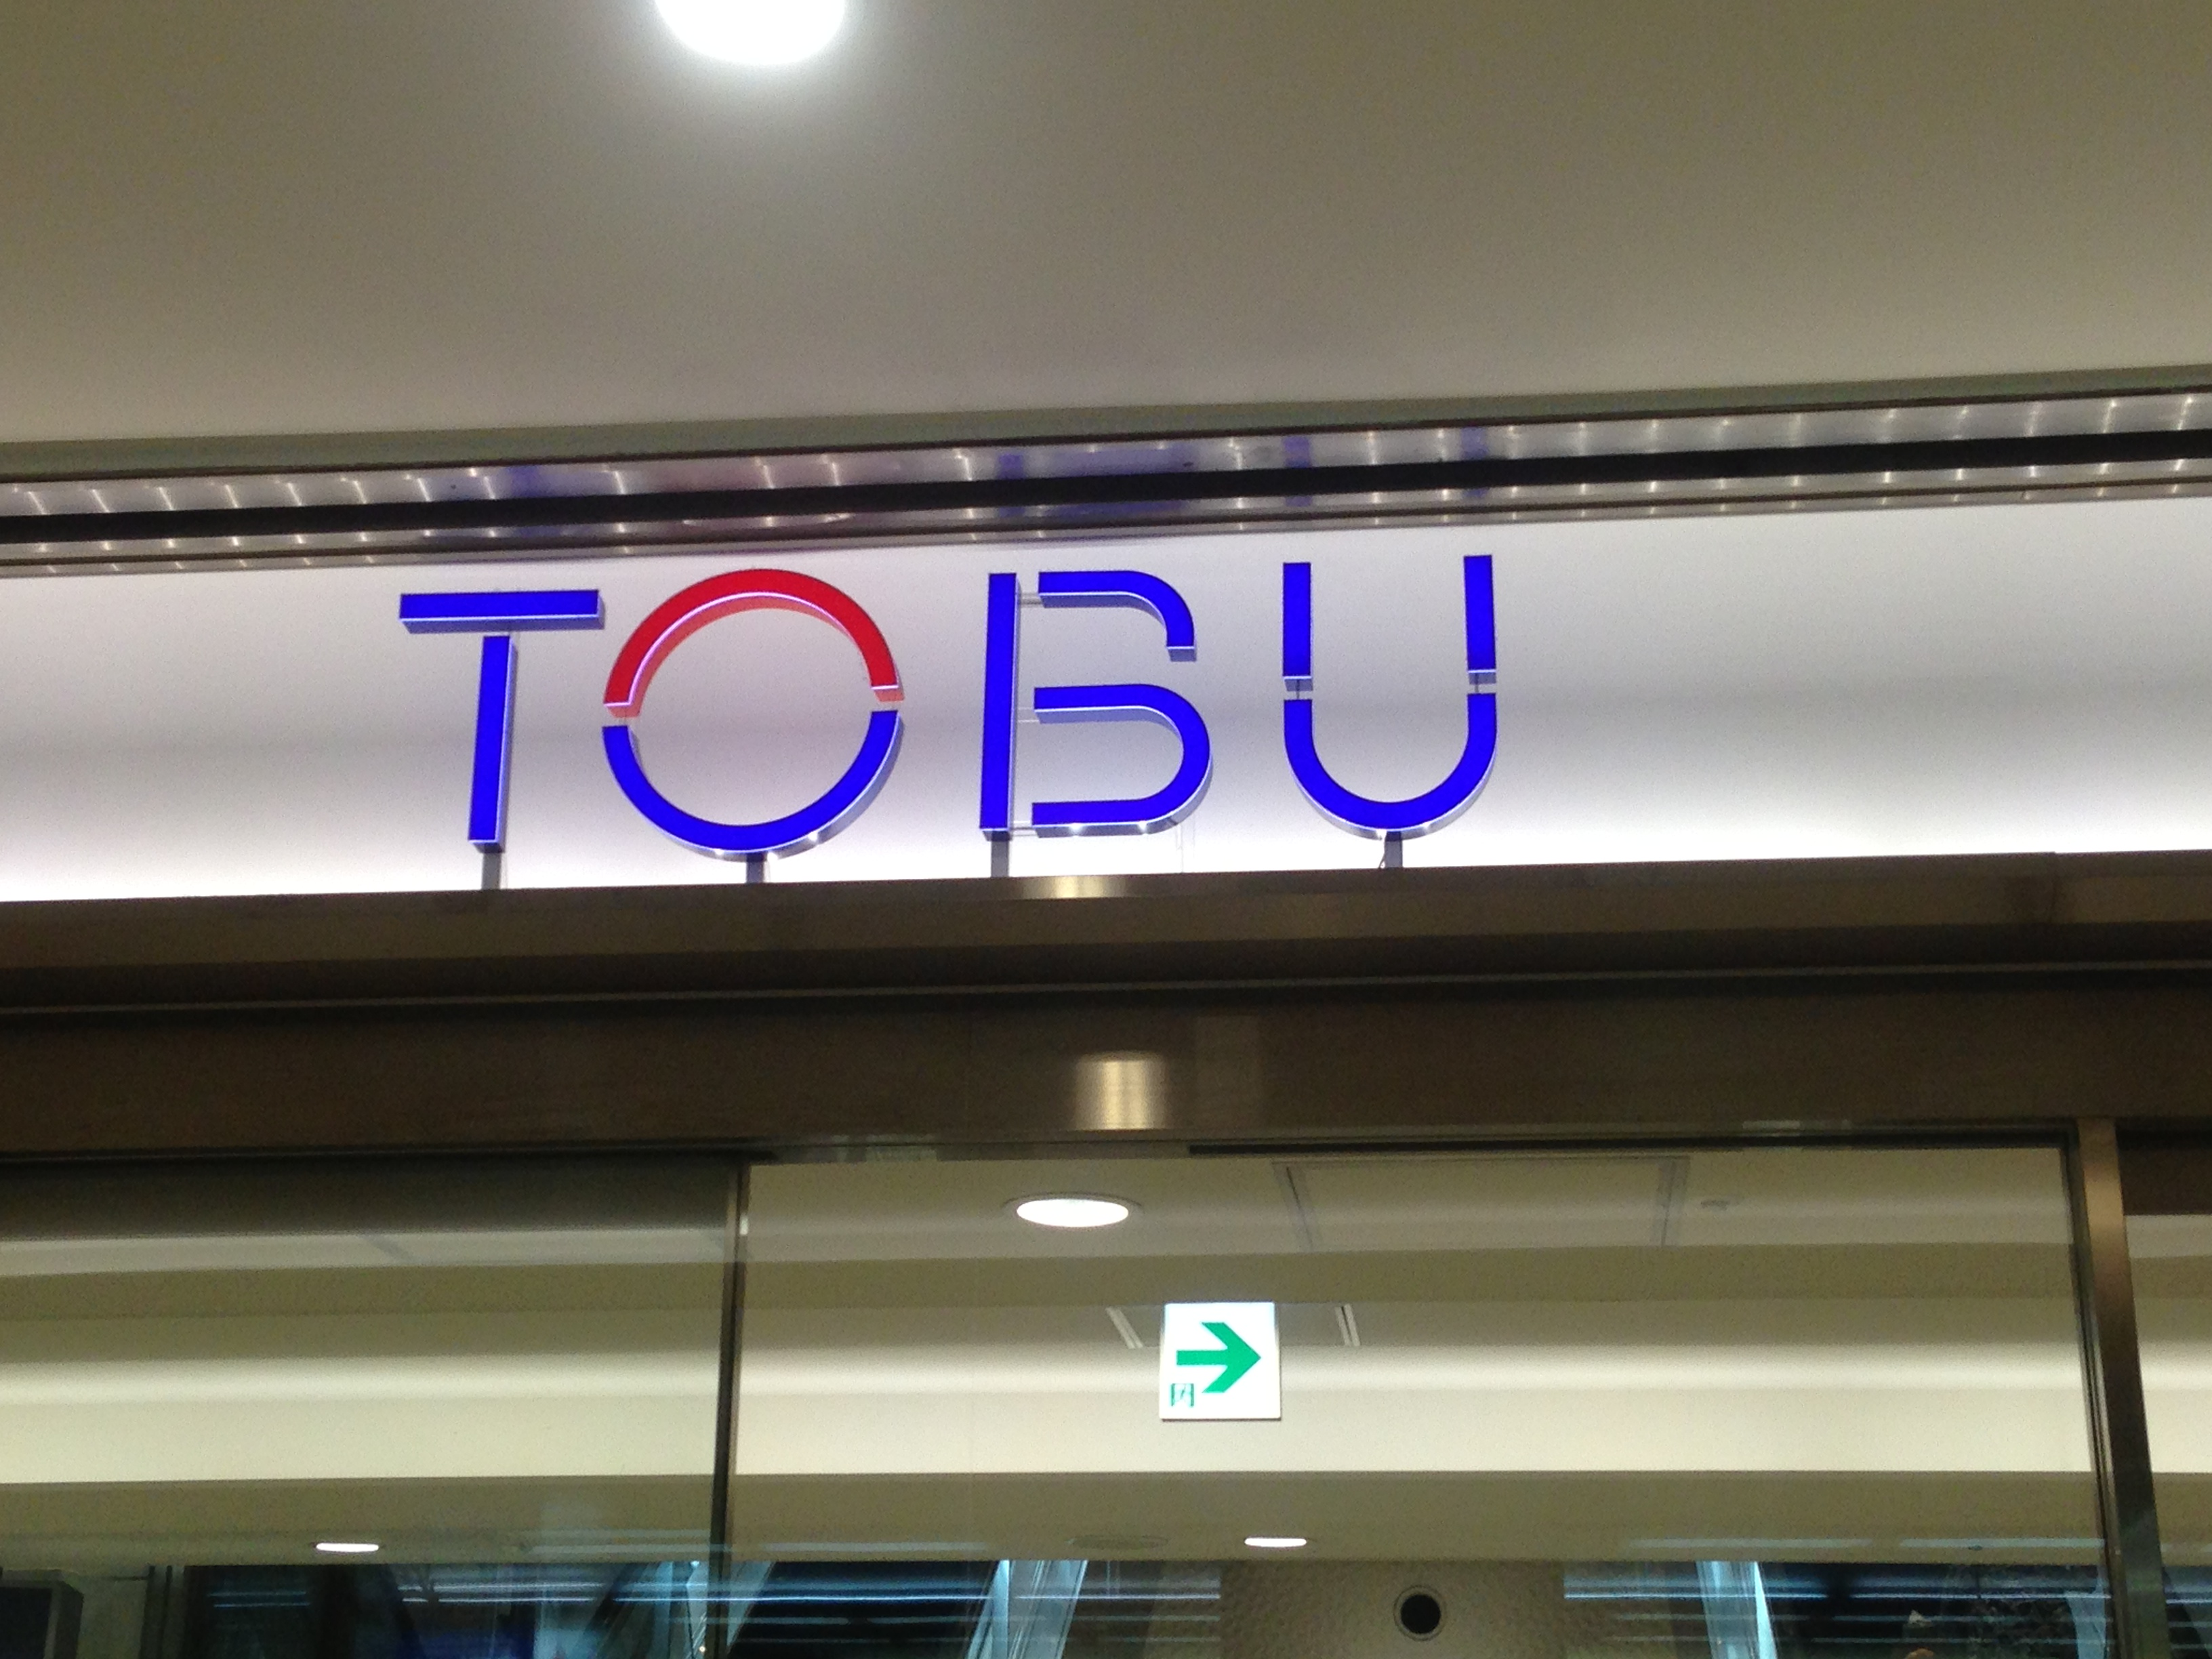 東武百貨店 - Wikipedia